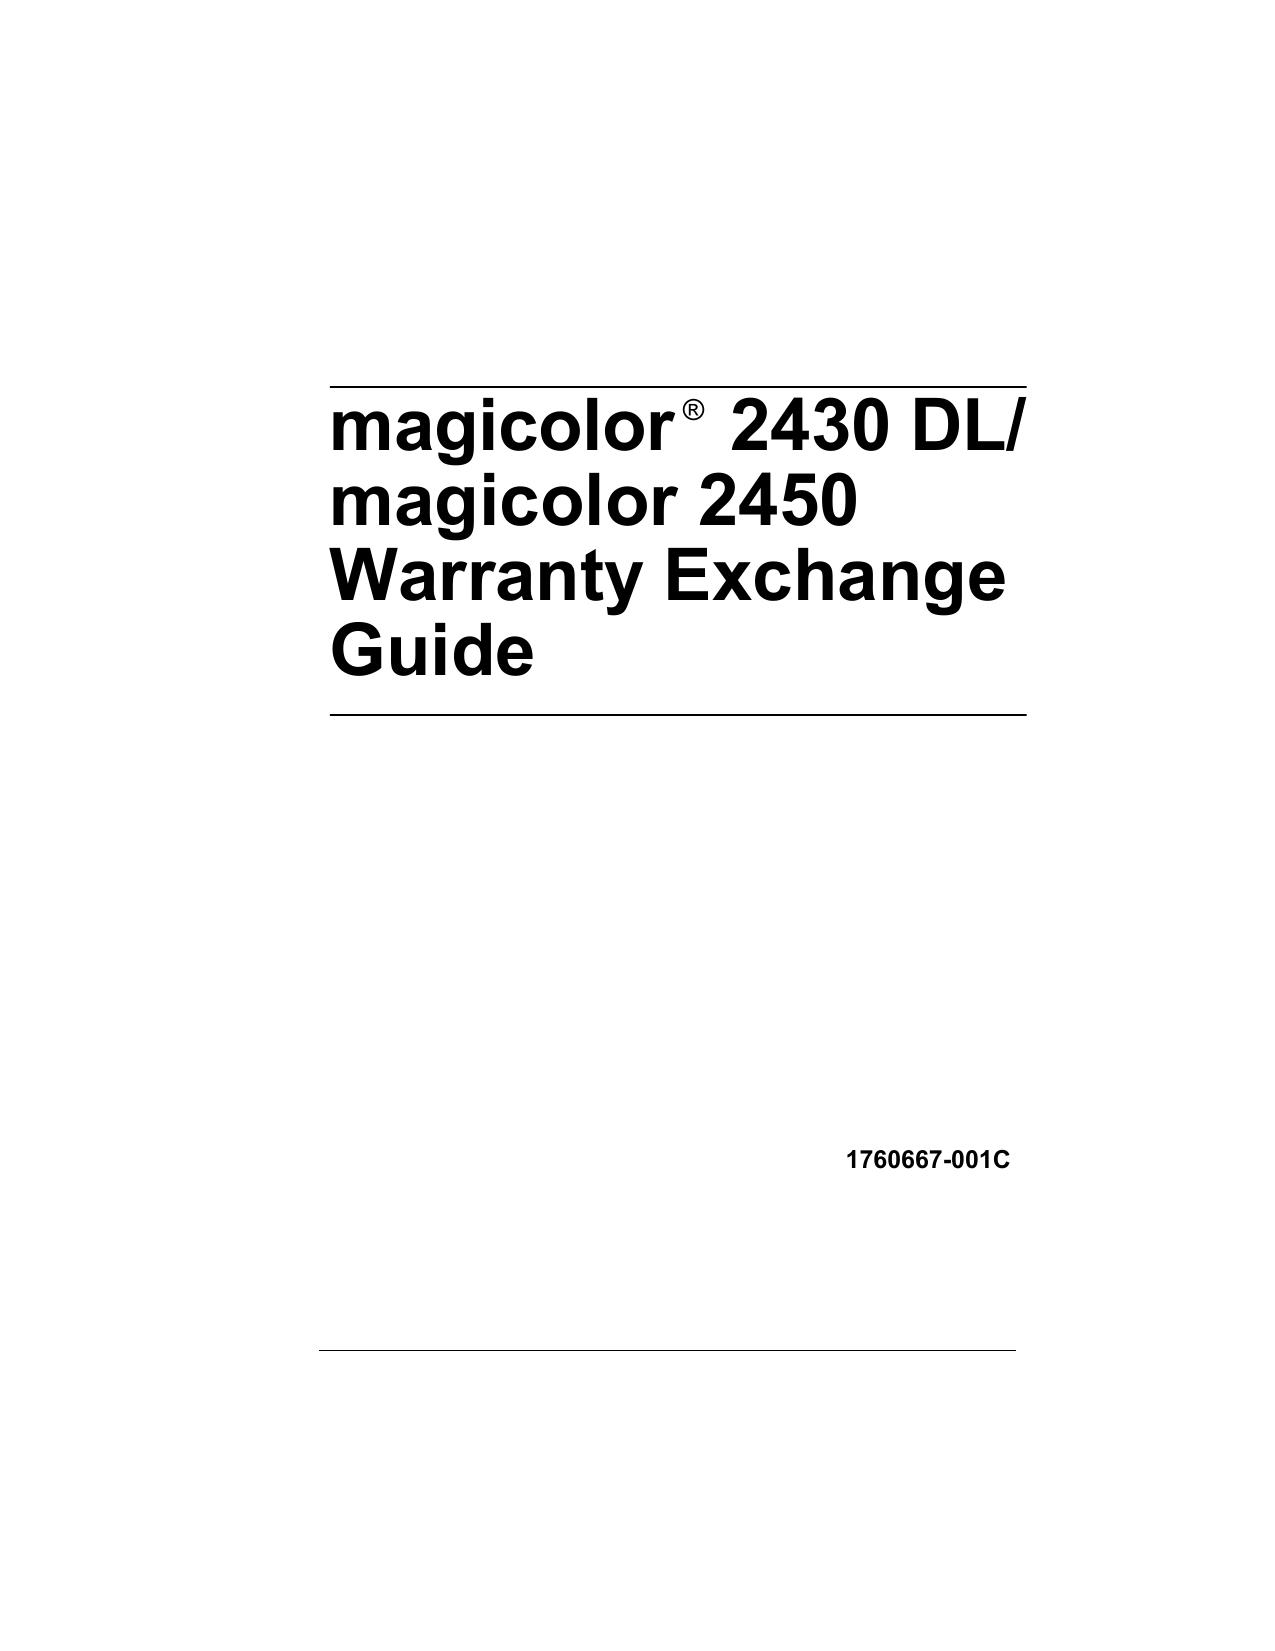 Konica Minolta Magicolor 2450, magicolor 2430 DL Manual